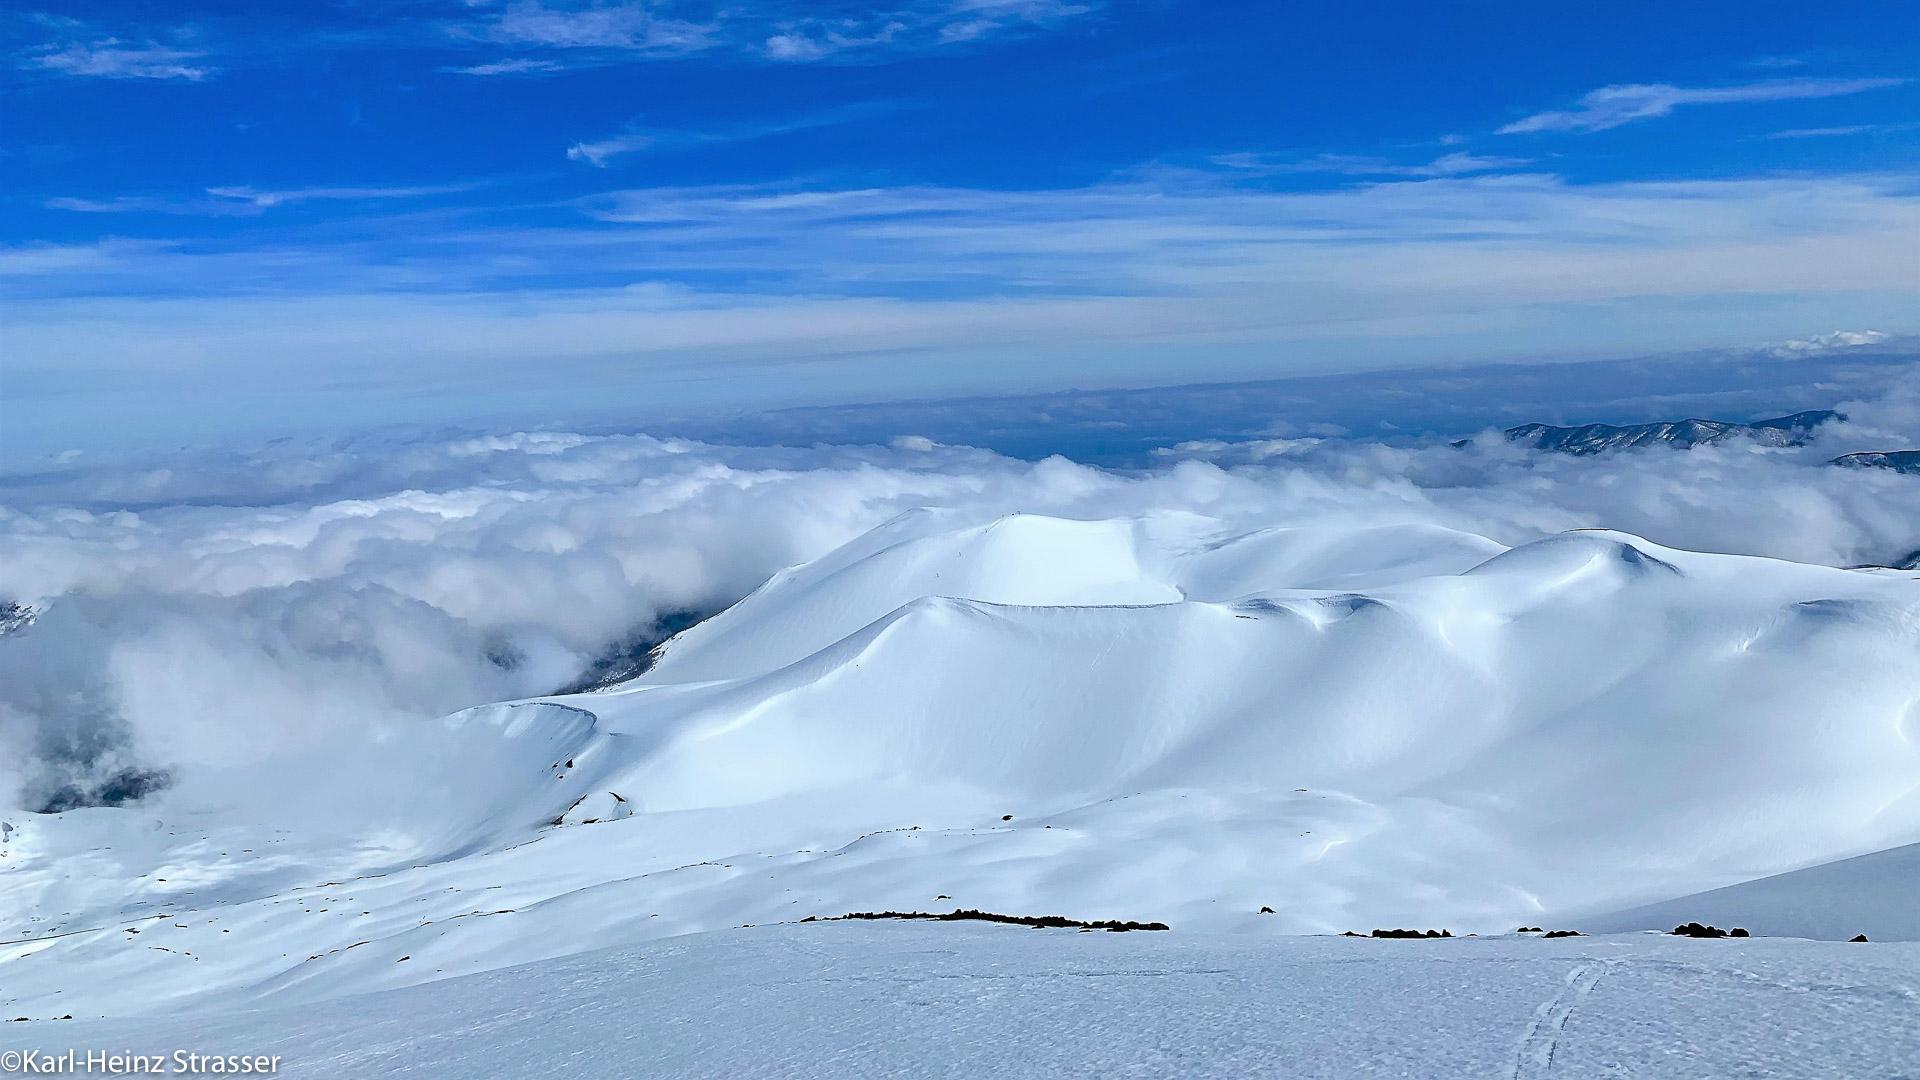 Weite Skitourenhänge